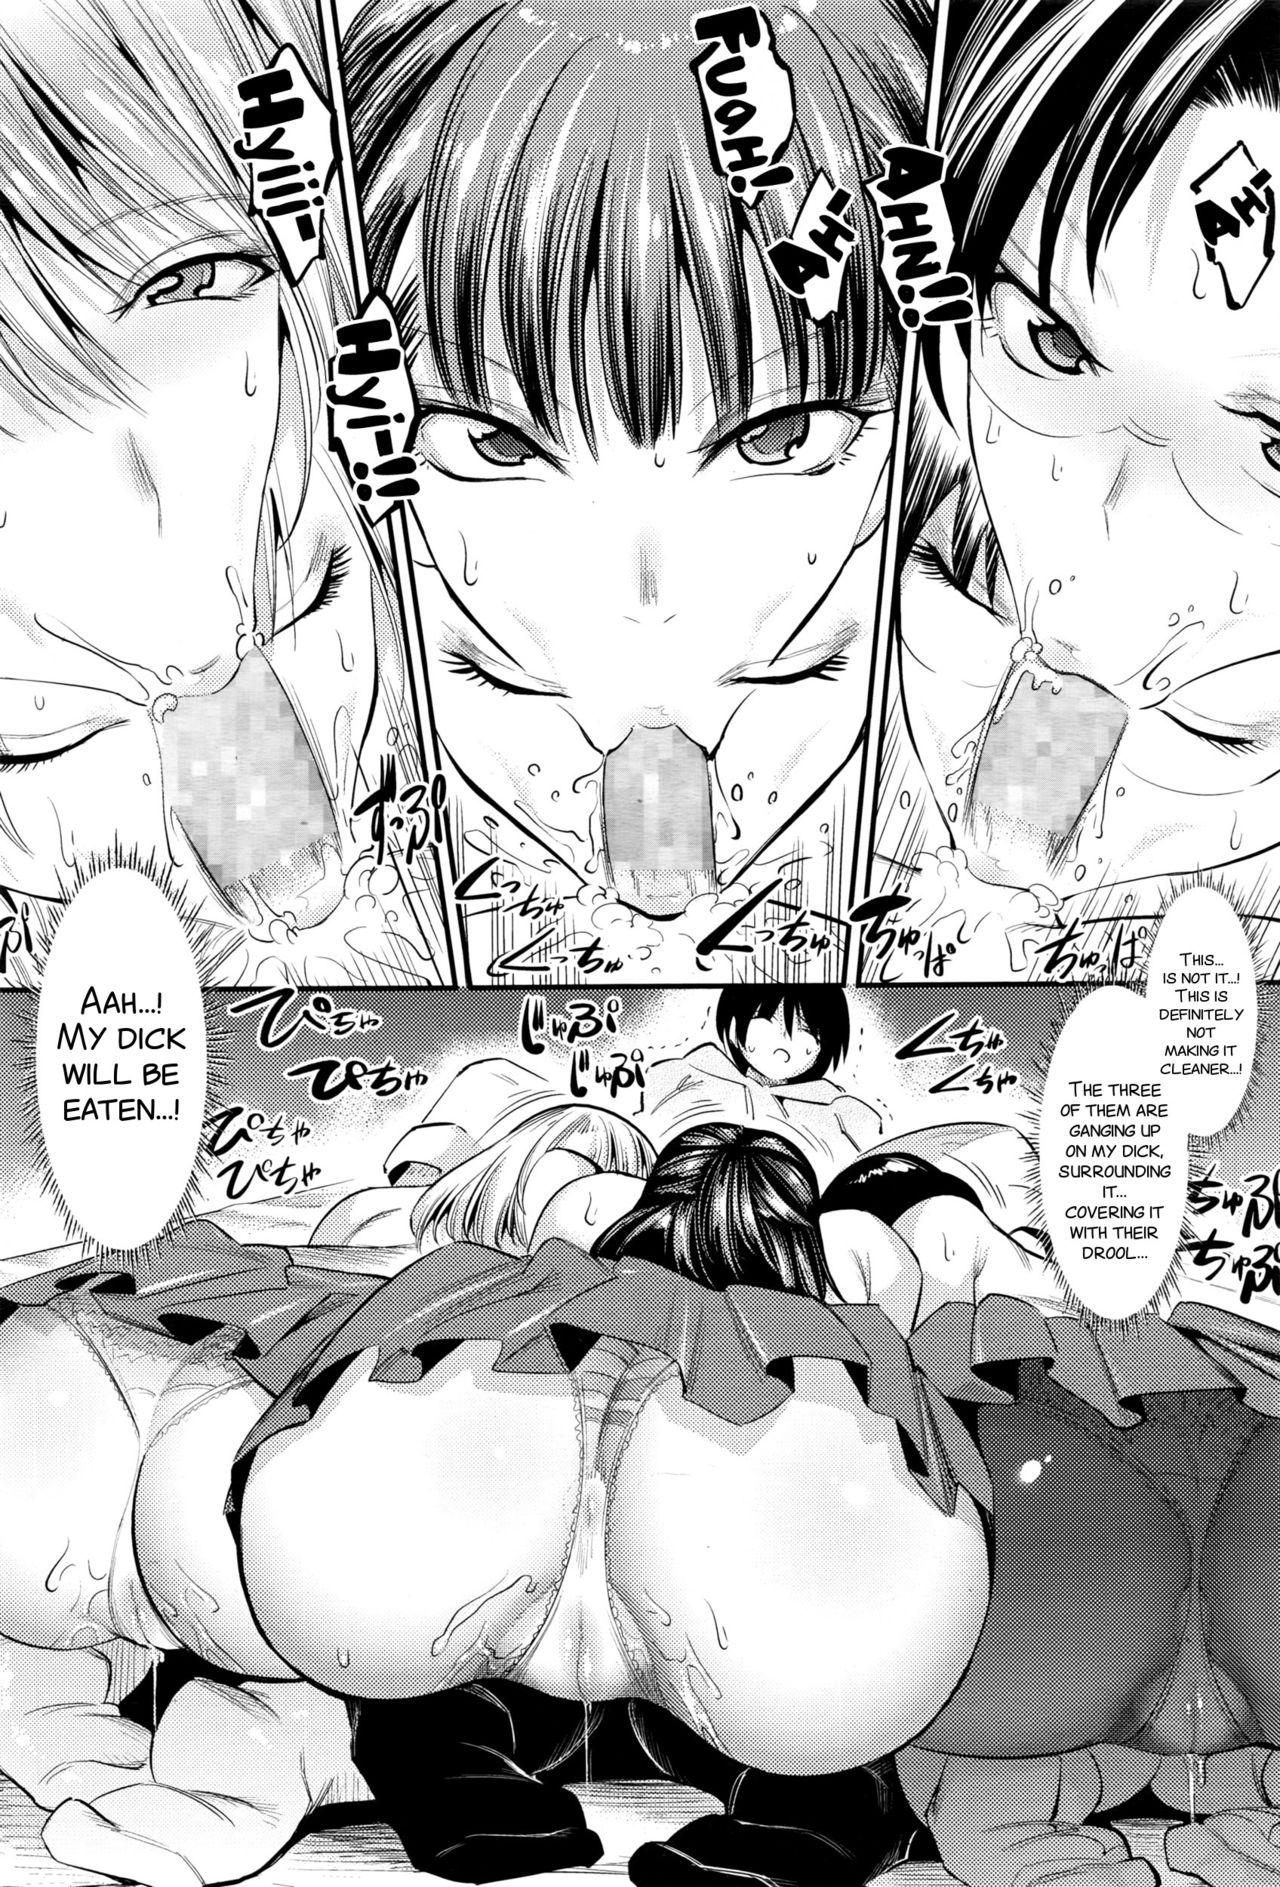 Hontou wa H na Onee-chan no Tomodachi 13